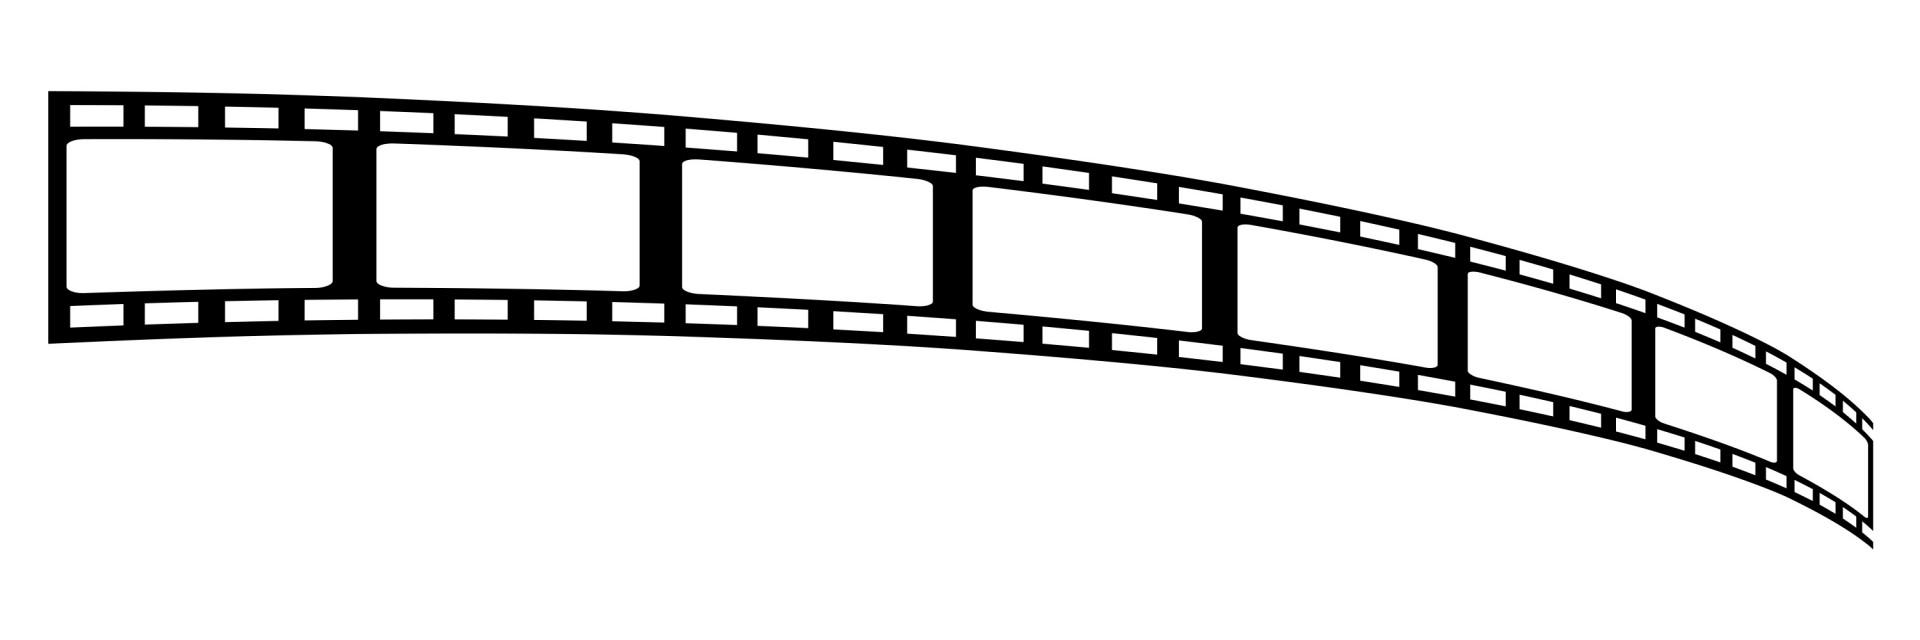 Film strip clip art at vector clip art.